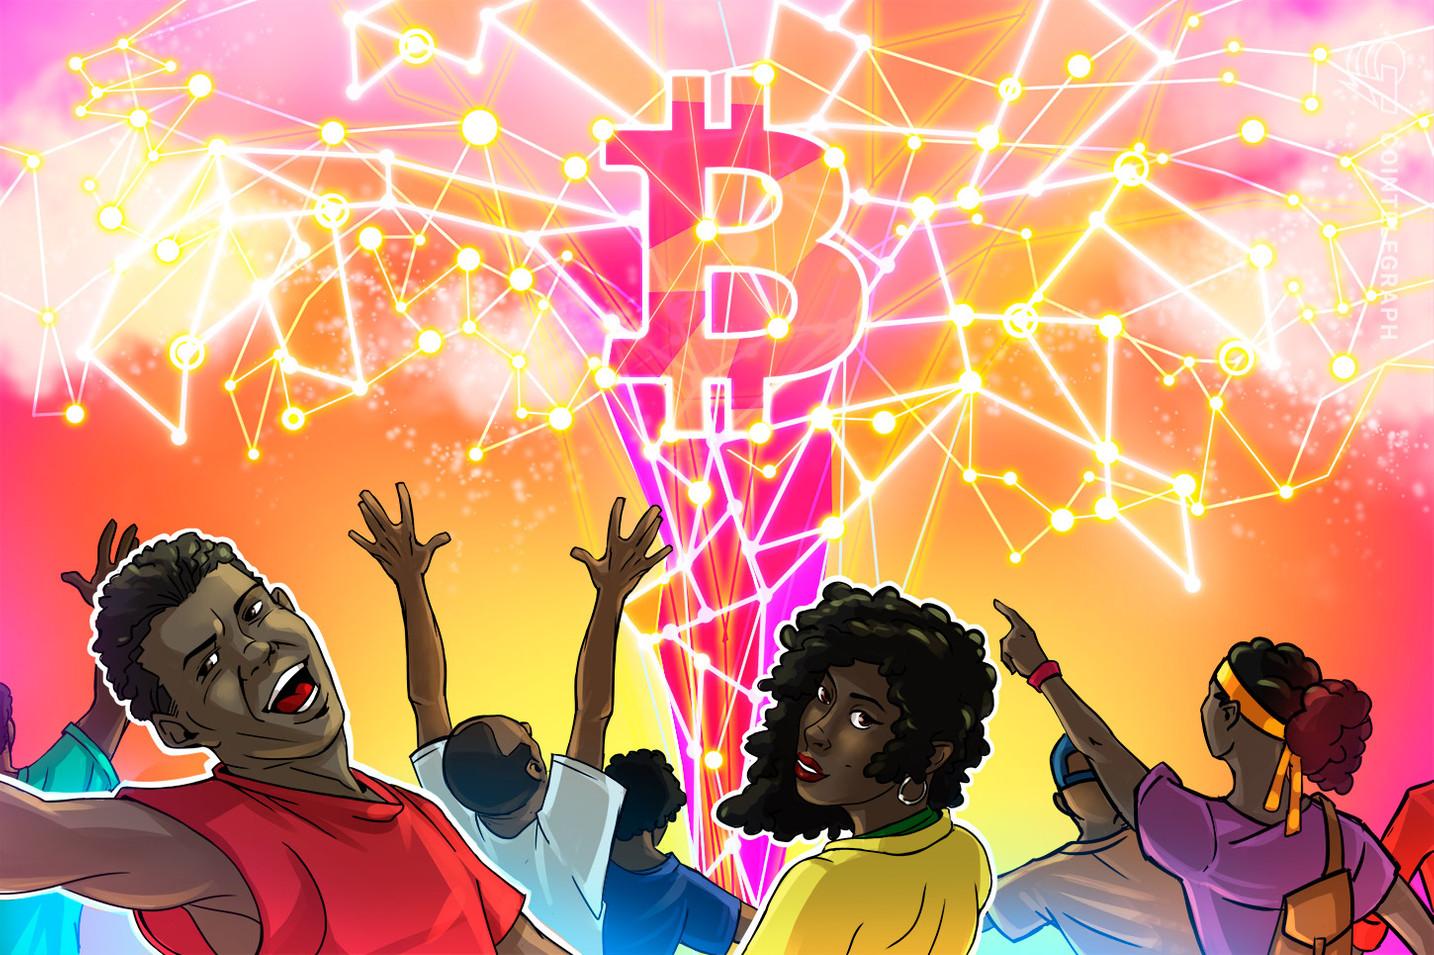 Nigerian secondary school will accept crypto payments despite regulatory uncertainty